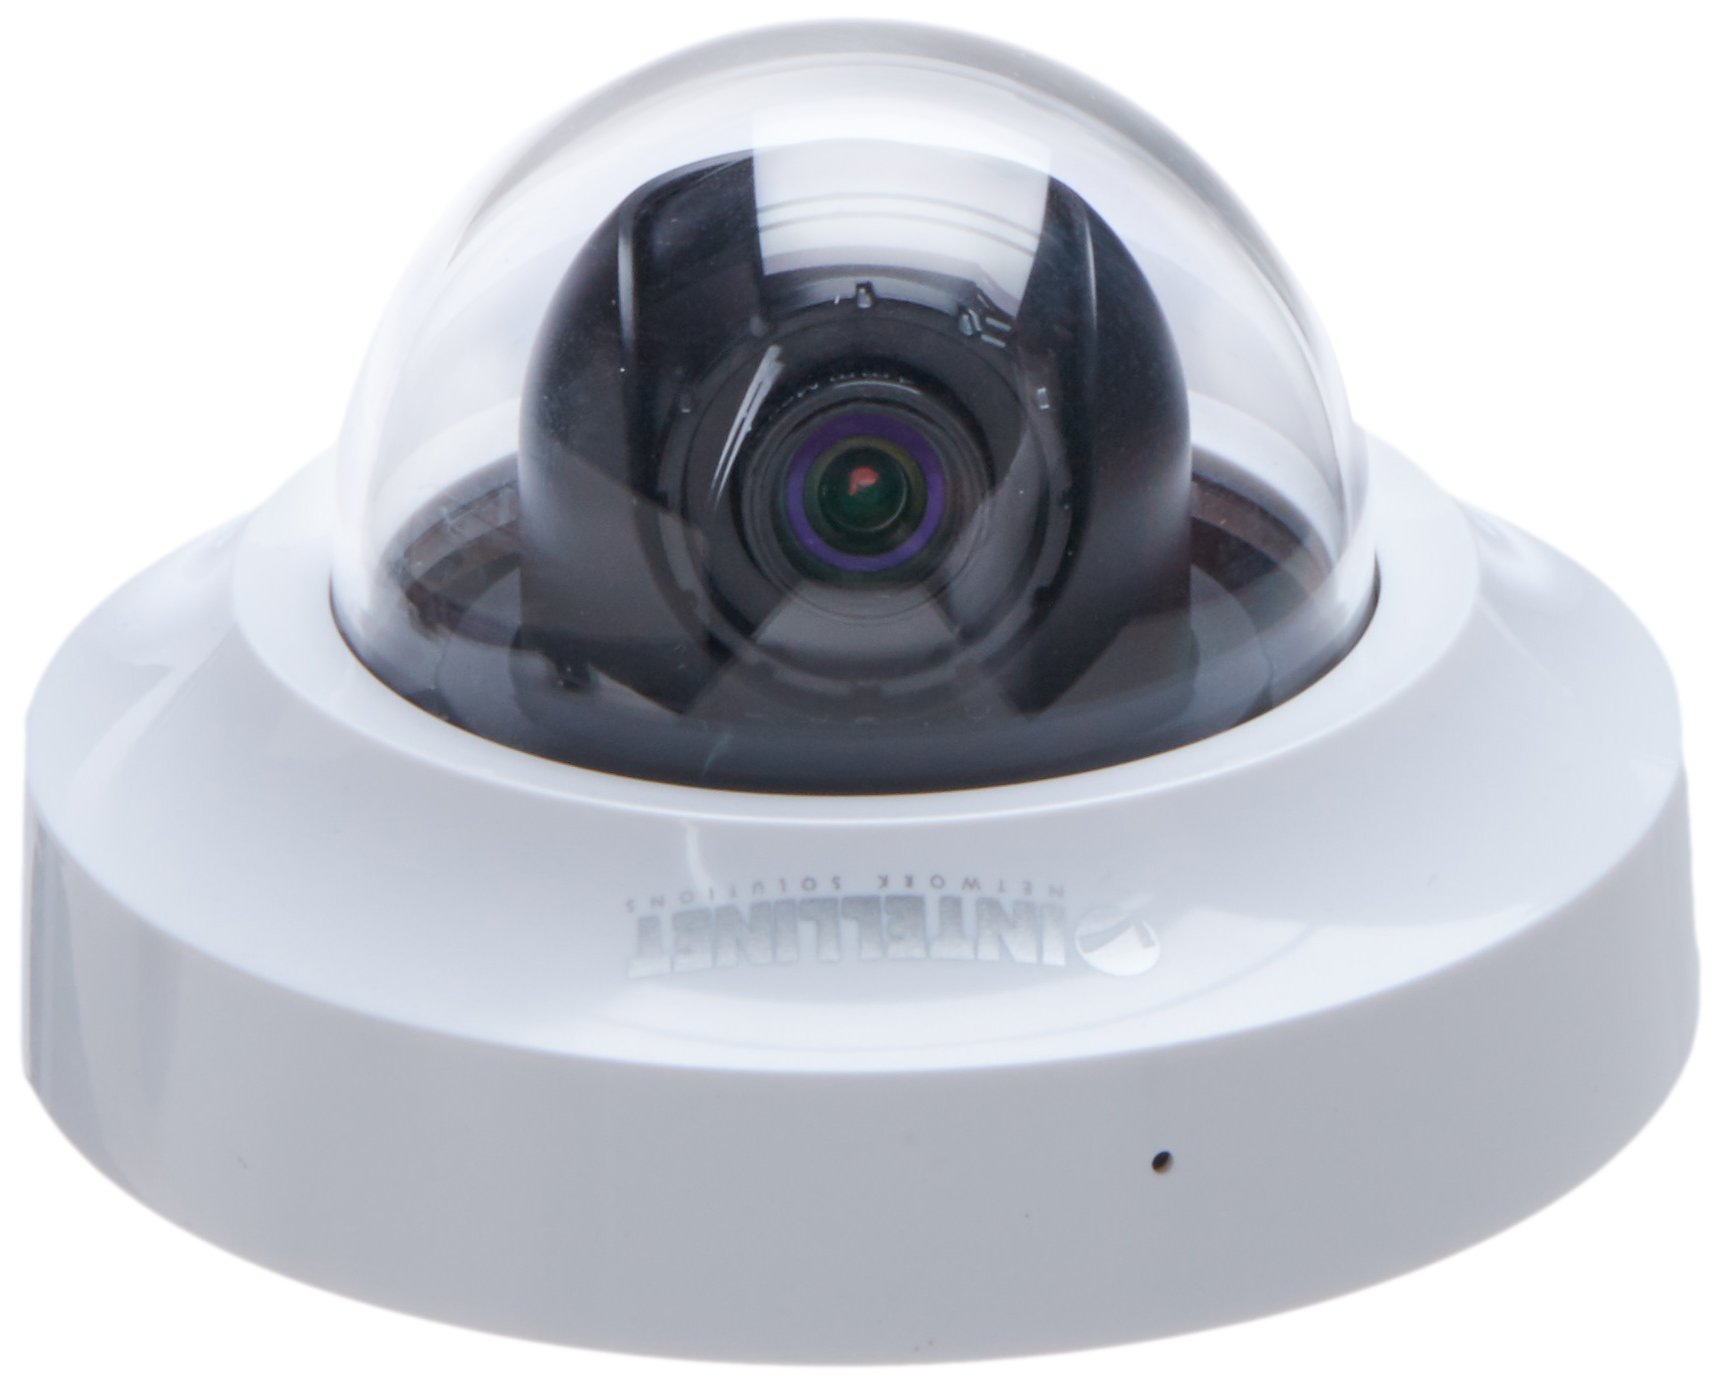 Intellinet 551441 HD 2.0 Megapixel Network Mini-Dome Camera (White)